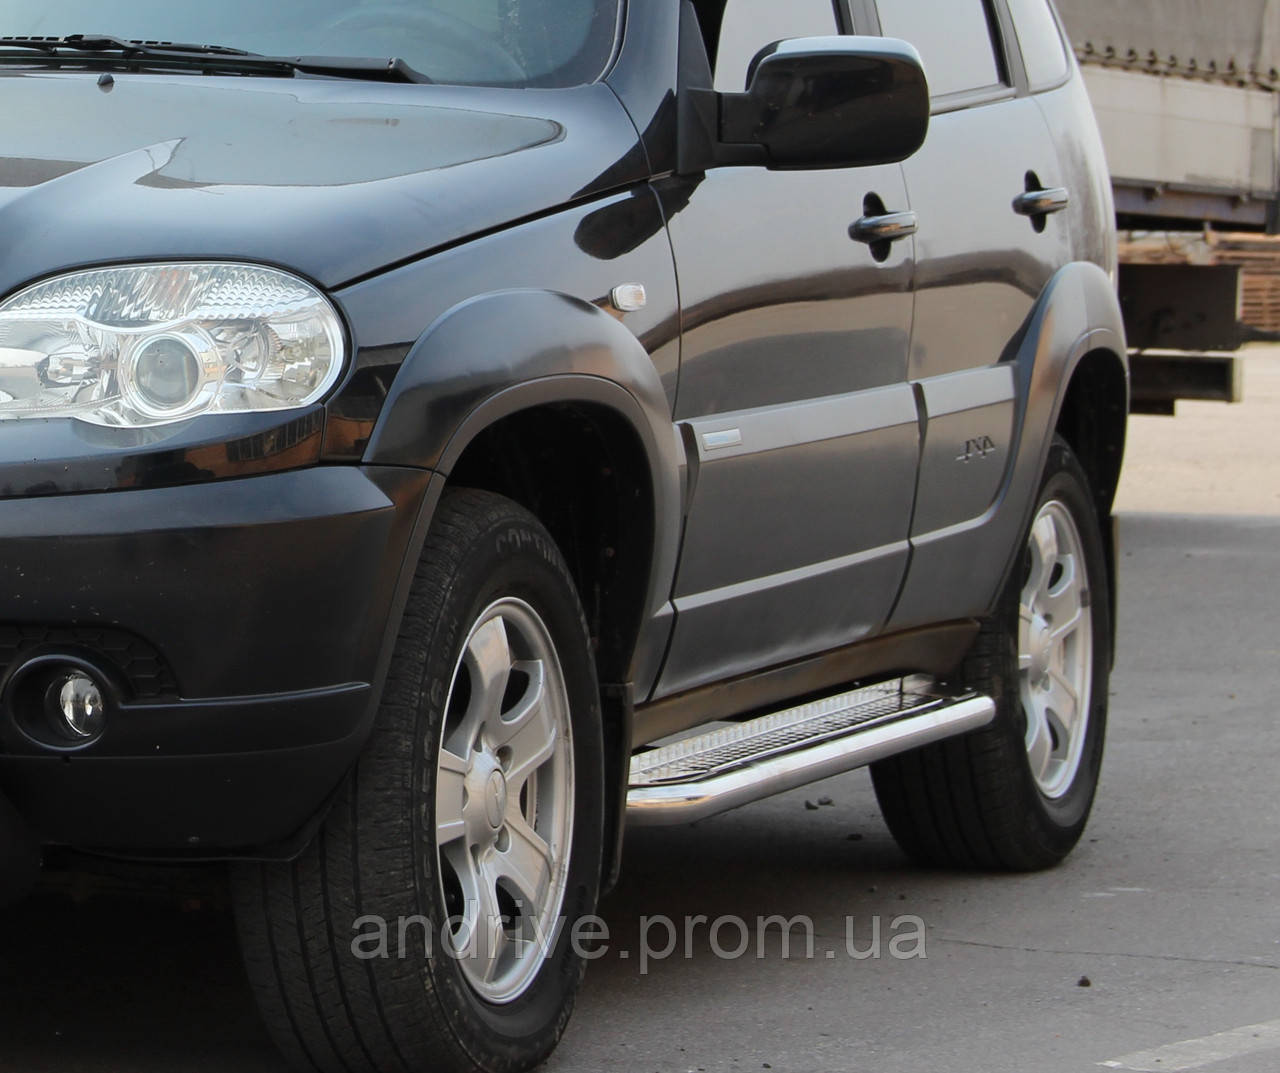 Пороги боковые (подножки-площадка) Chevrolet Niva 2009+ (Ø42)